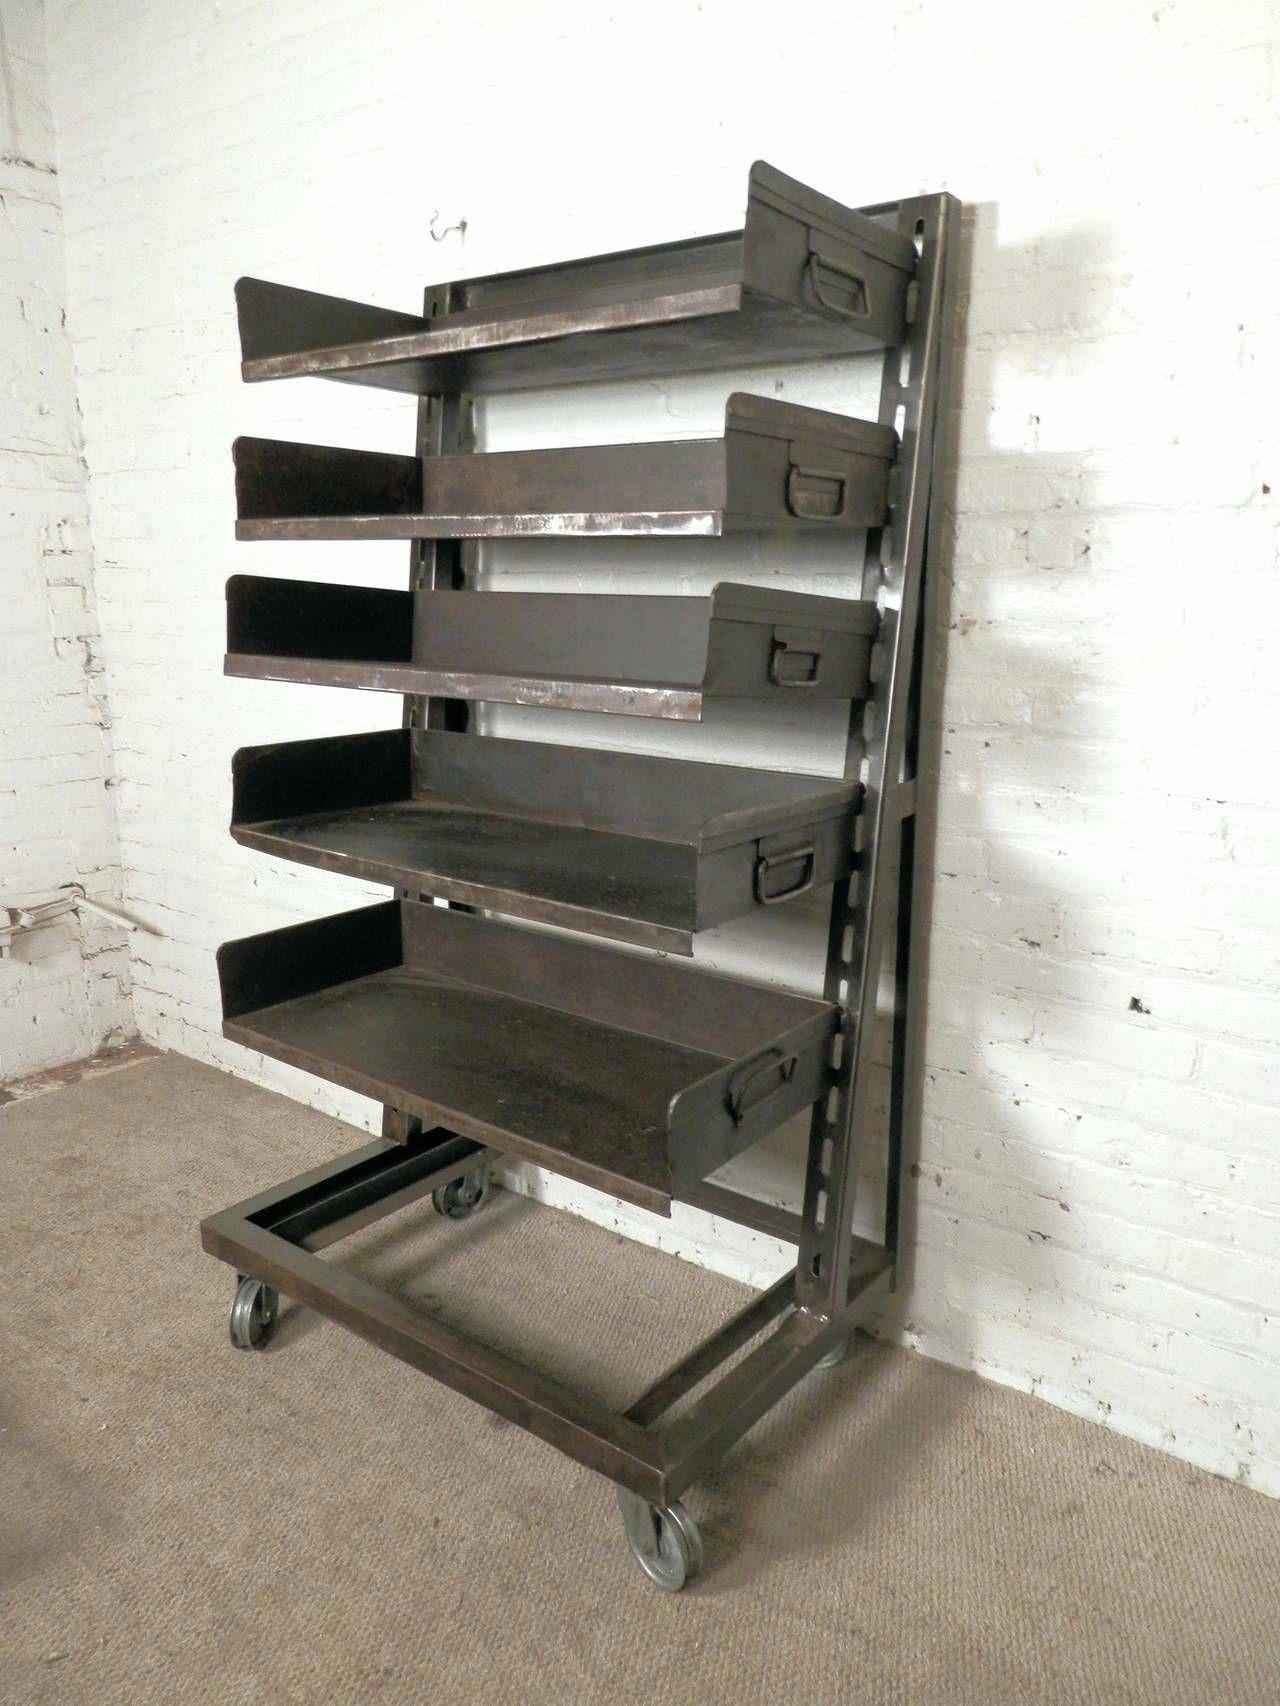 Best Of Rayonnage Castorama Metal Shelving Units Industrial Metal Shelving Decorating Shelves